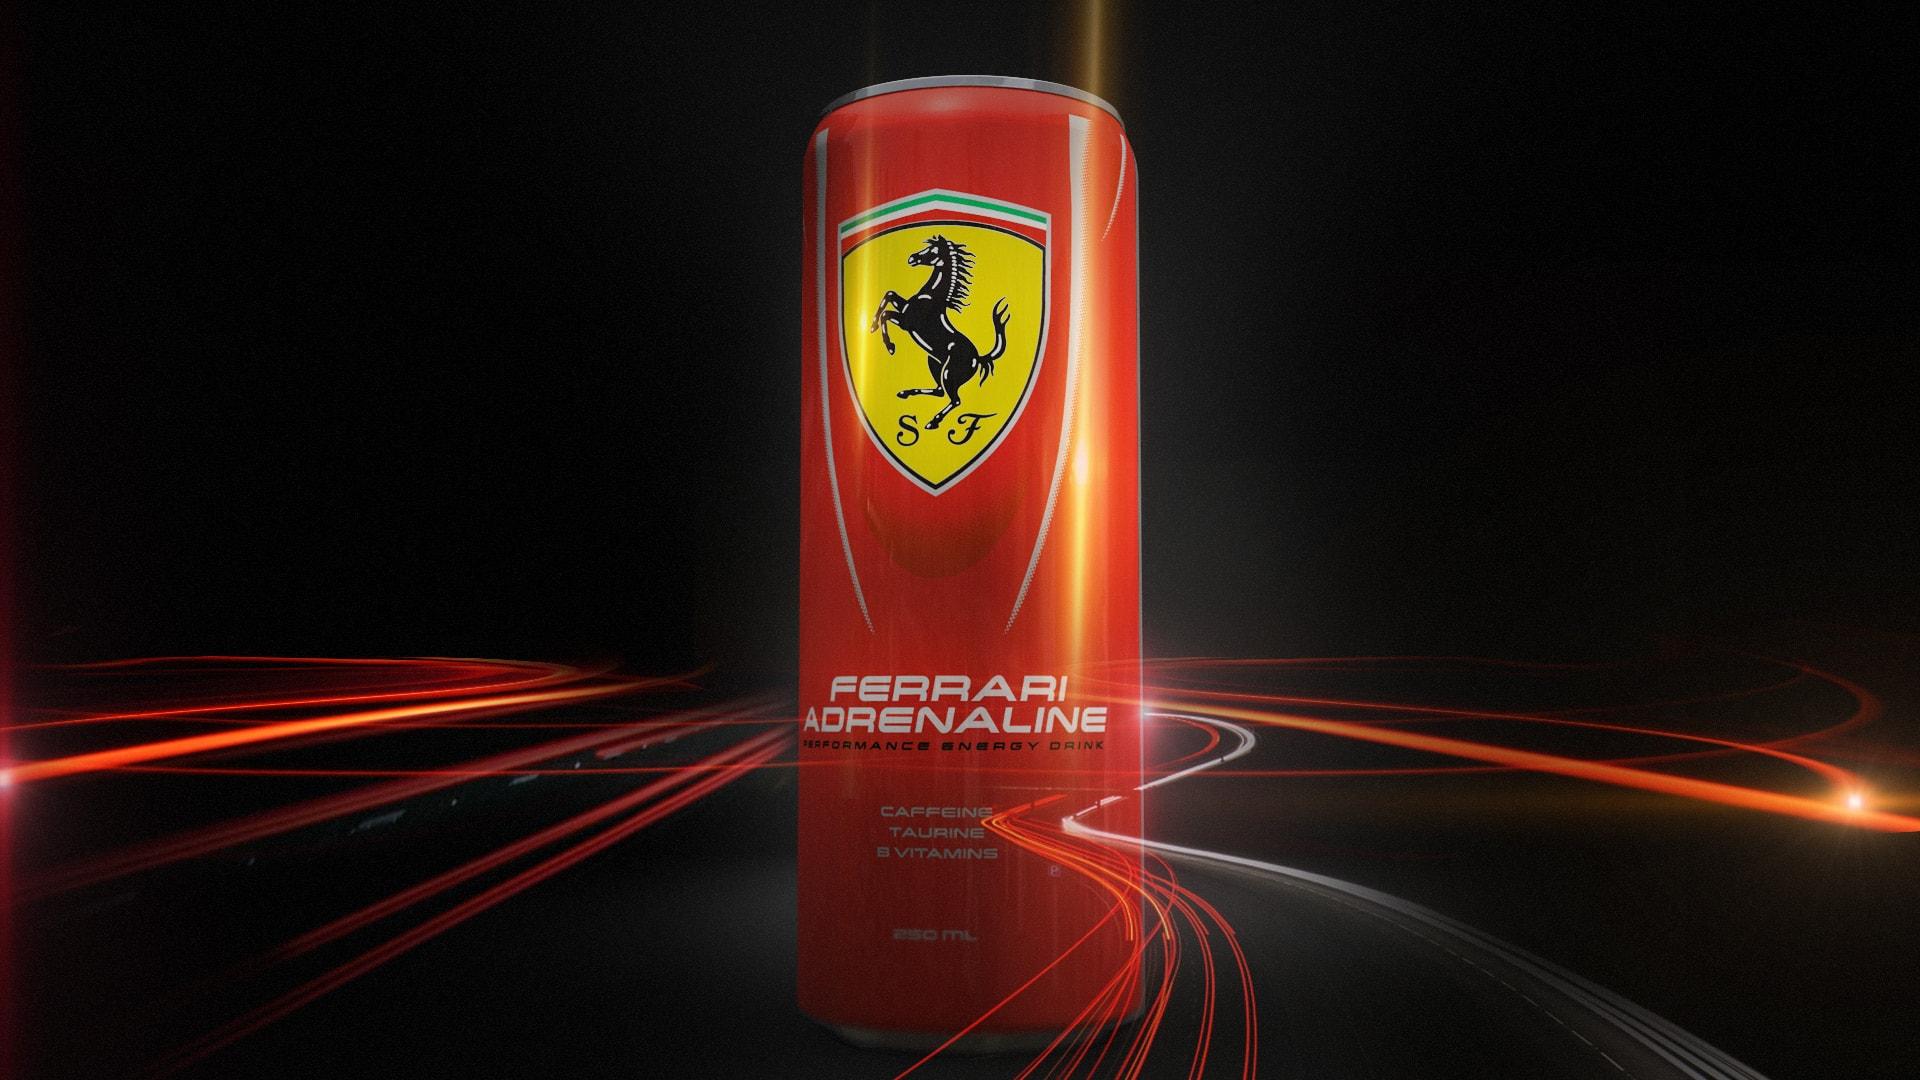 Ferrari Adrenaline-details-suspect-santasombra-victor-ruano